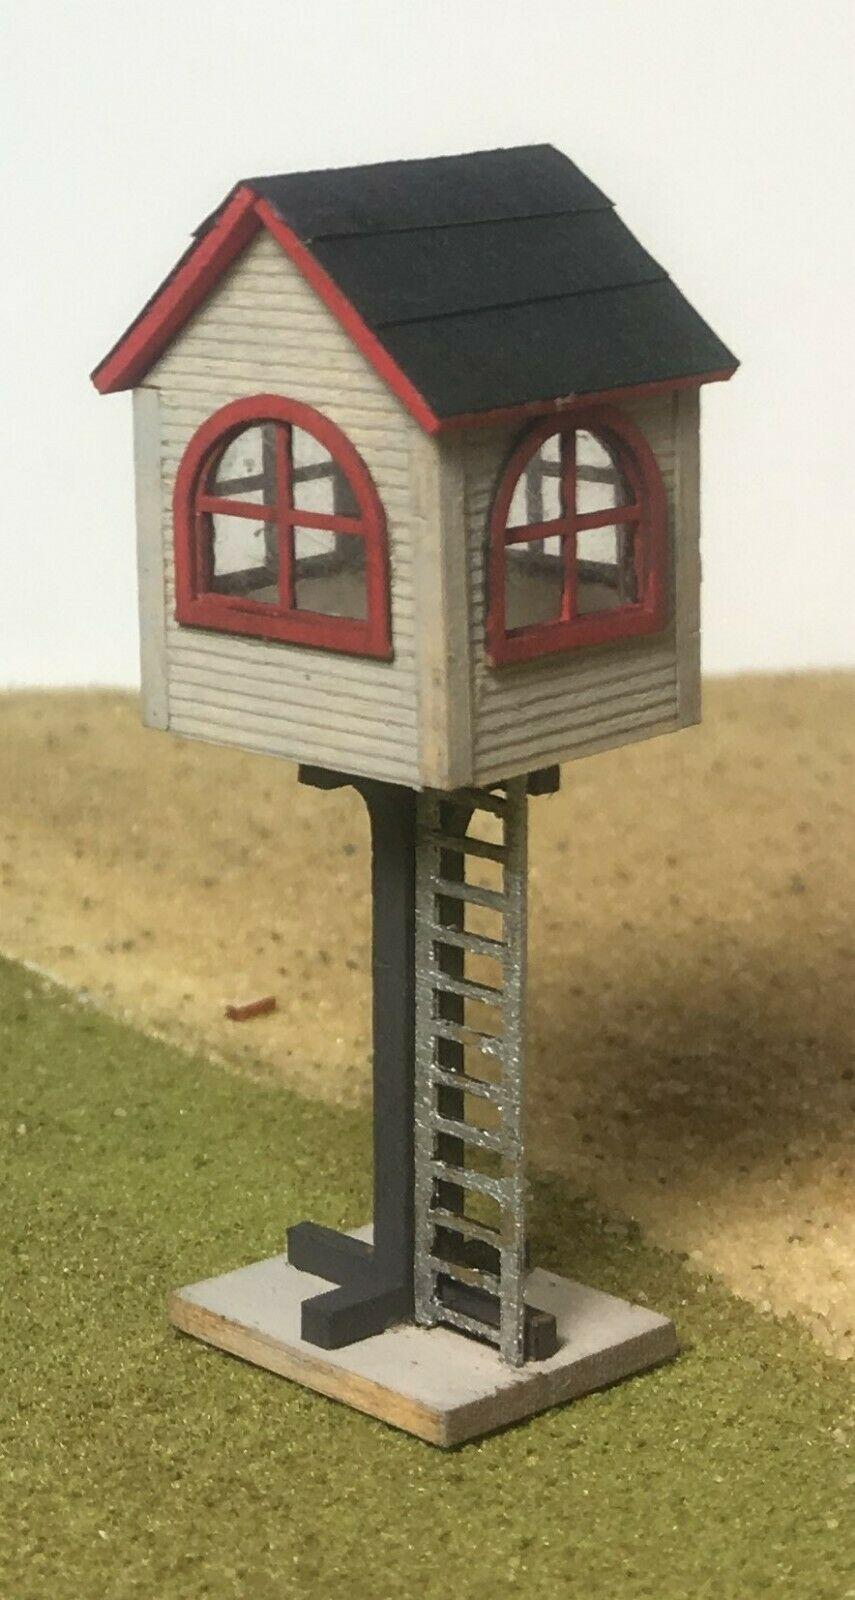 N Scale - Motrak Models - 13401 - Structure, Railroad, Watch Tower - Railroad Structures - Watch Tower